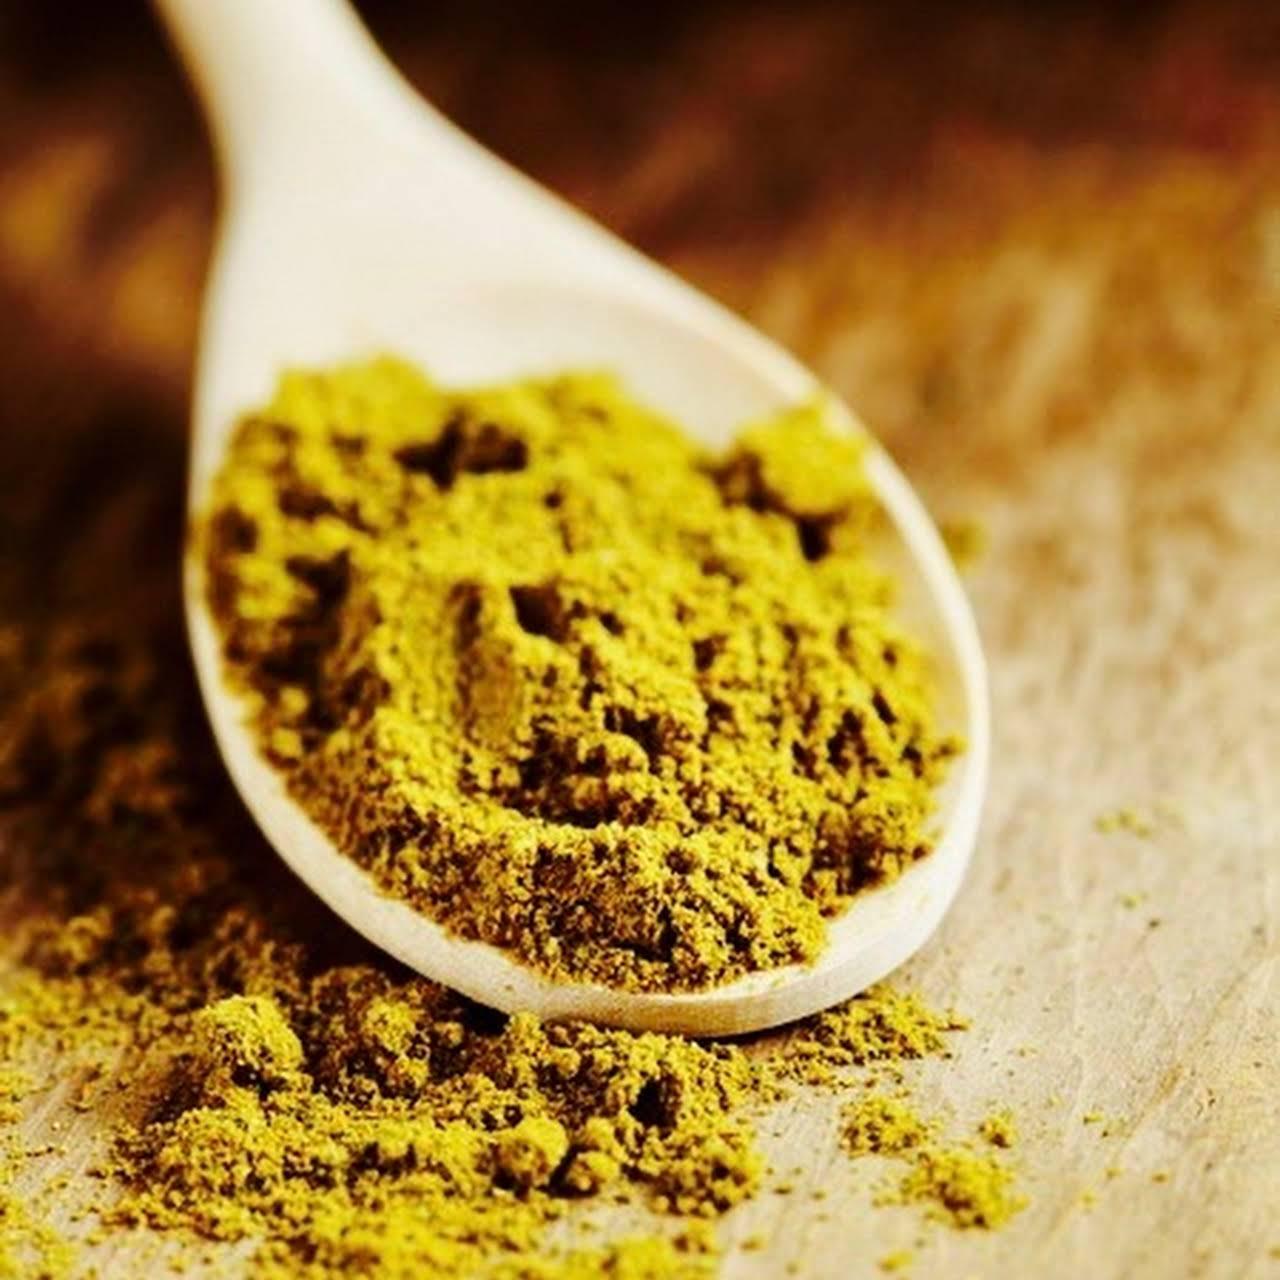 The Hirshon Georgian Khmeli Suneli Spice  blend – ხმელი სუნელი